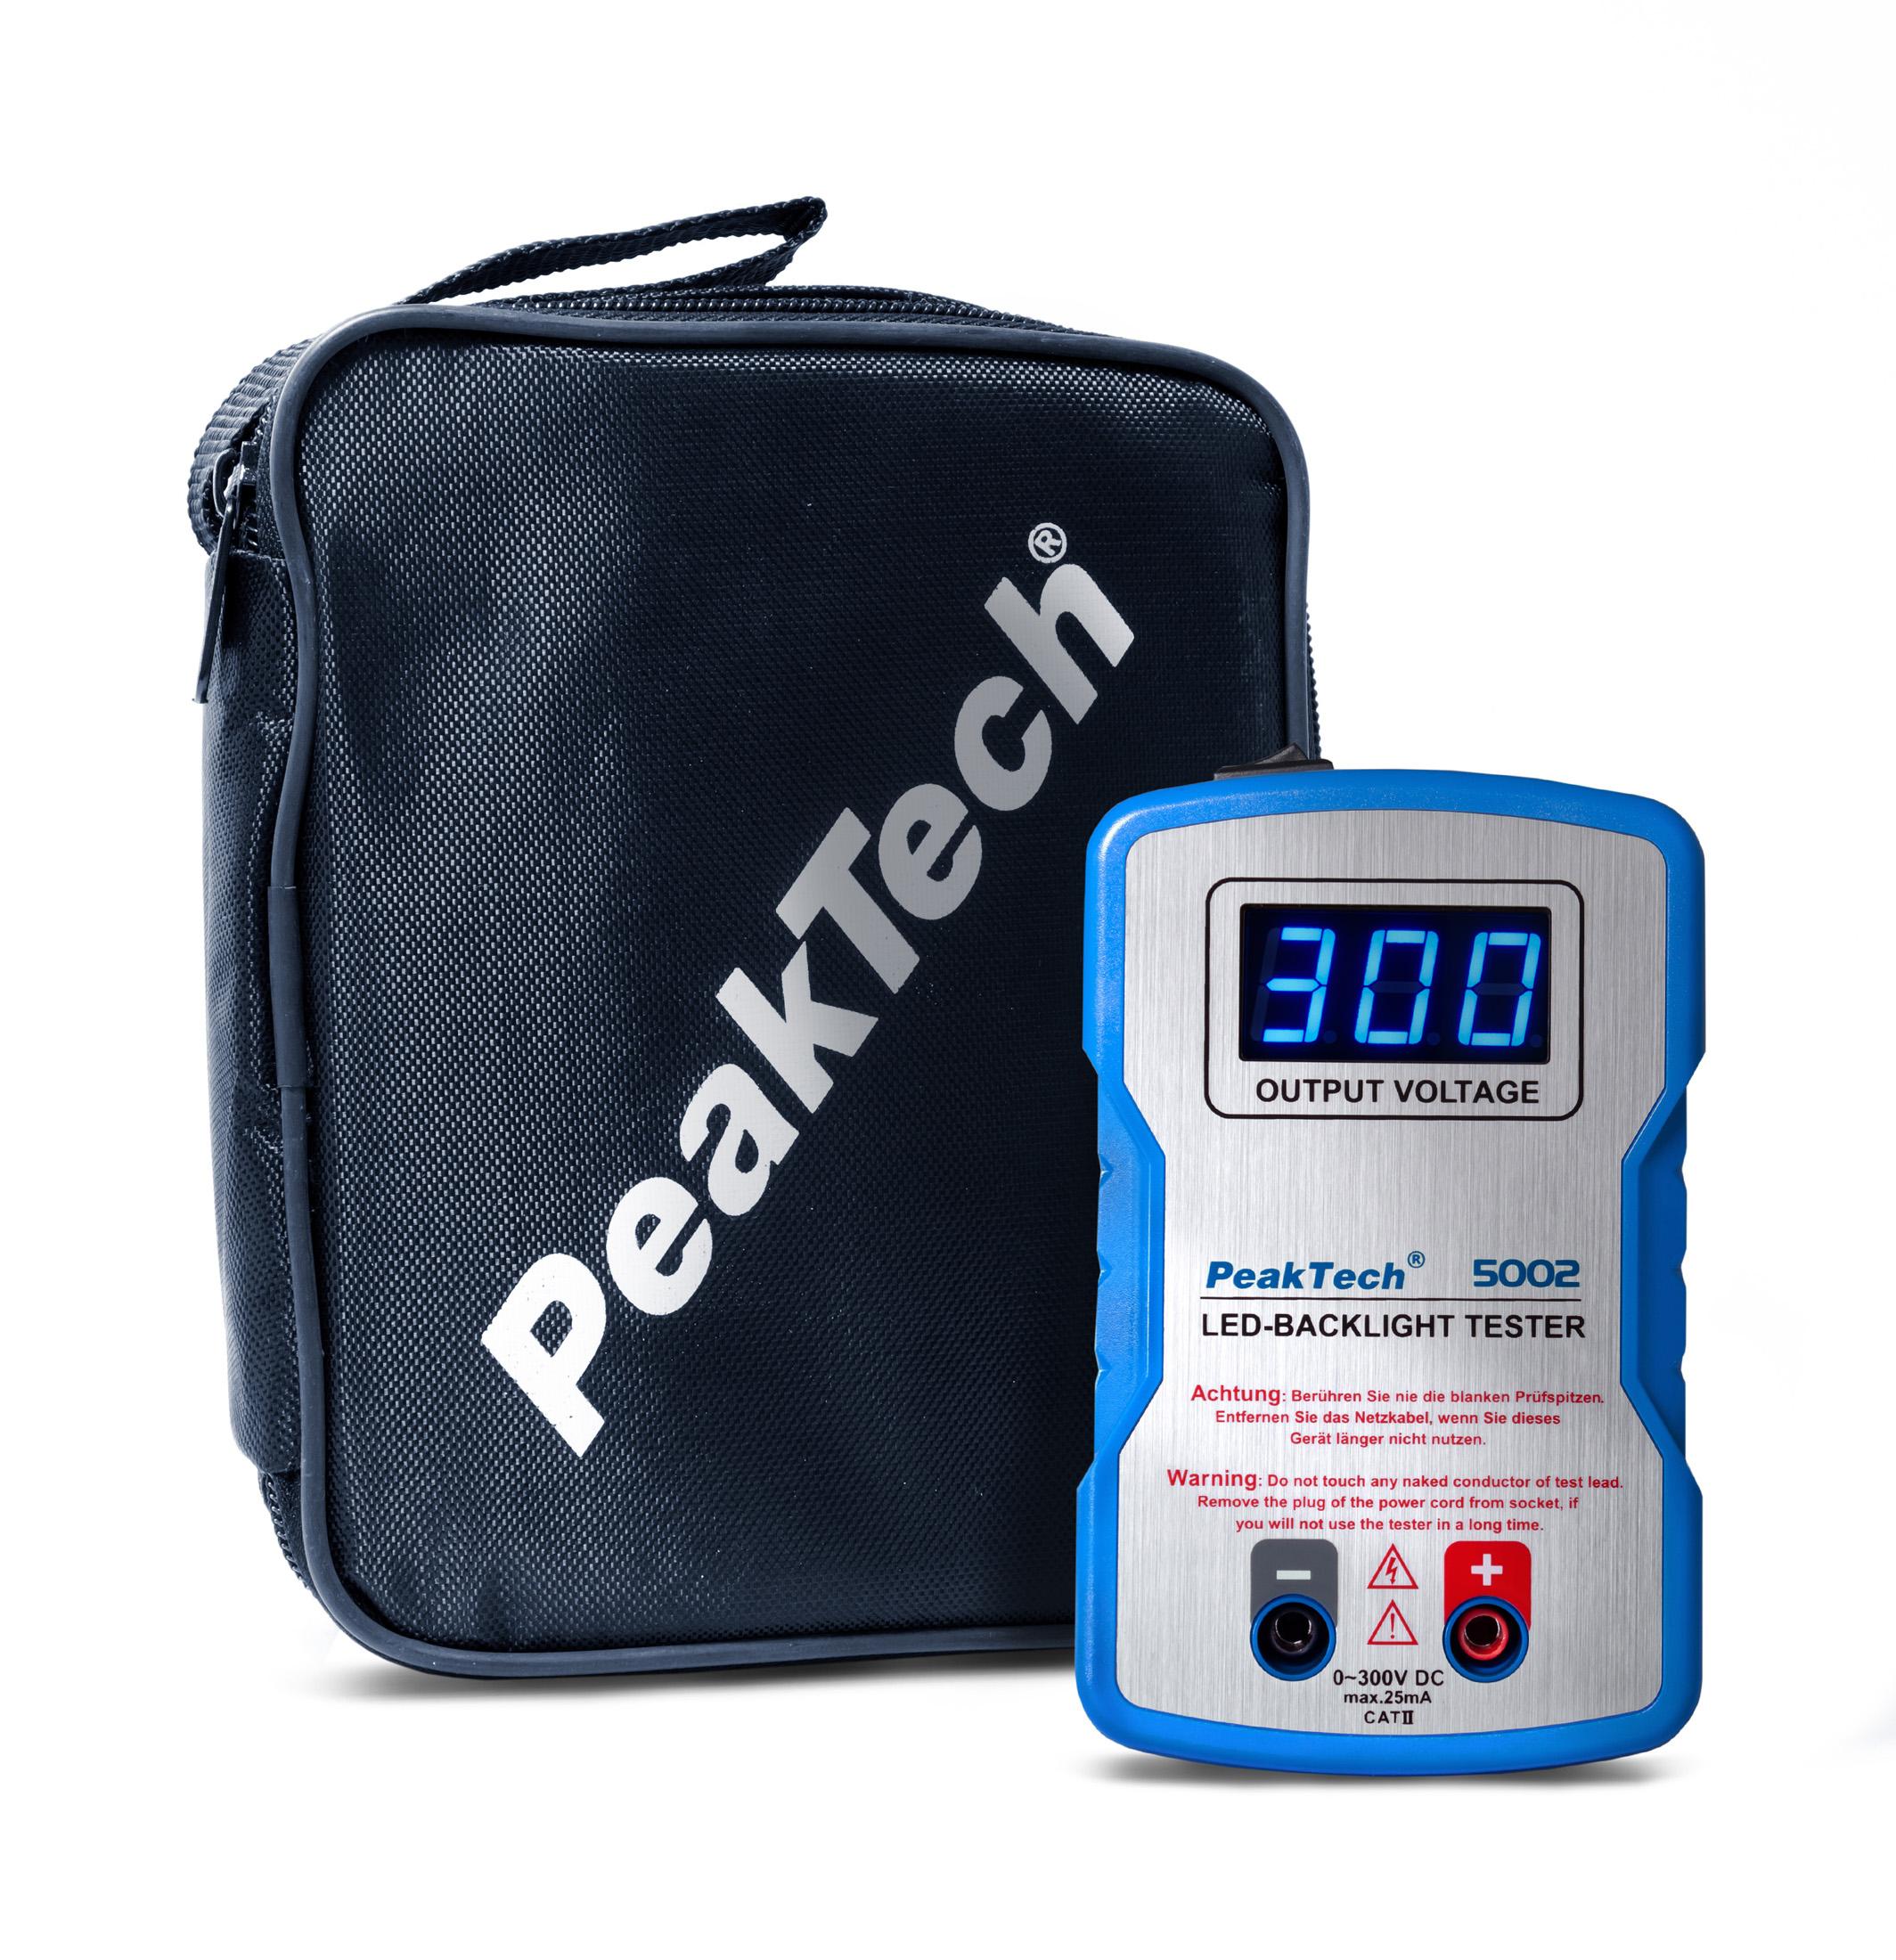 miernik led peaktech 5002